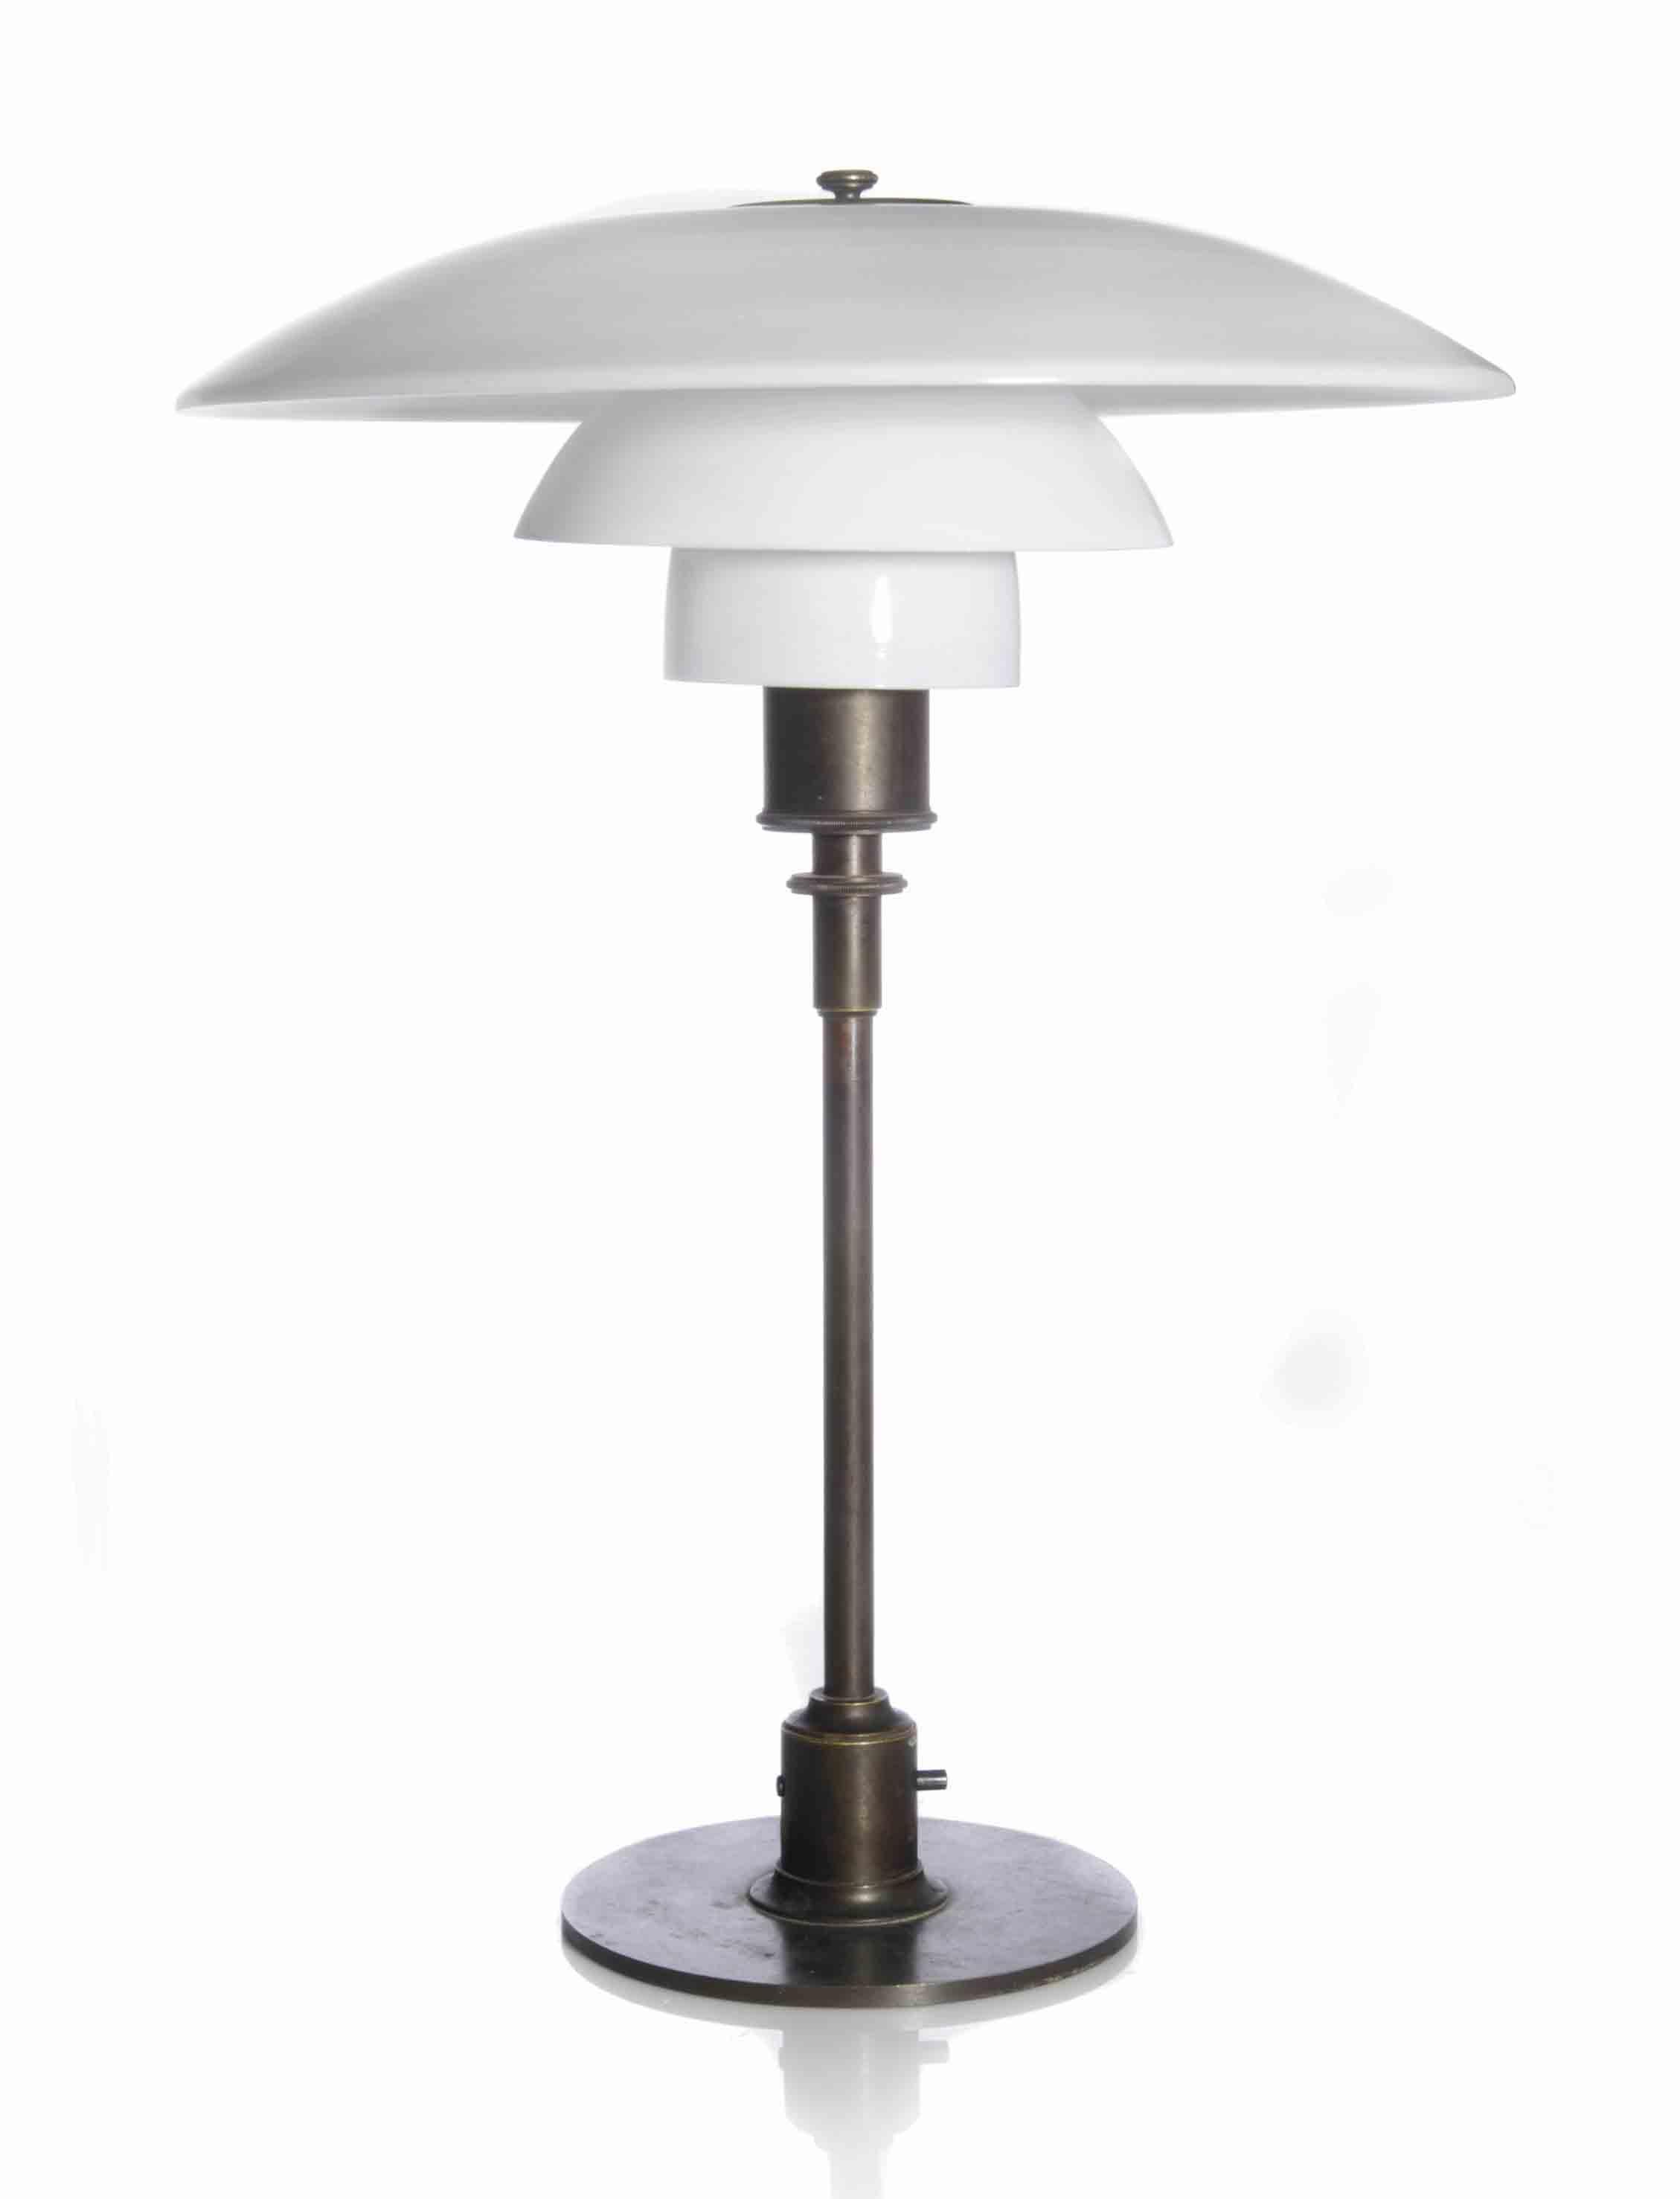 A POUL HENNINGSEN PH-4 TABLE LAMP